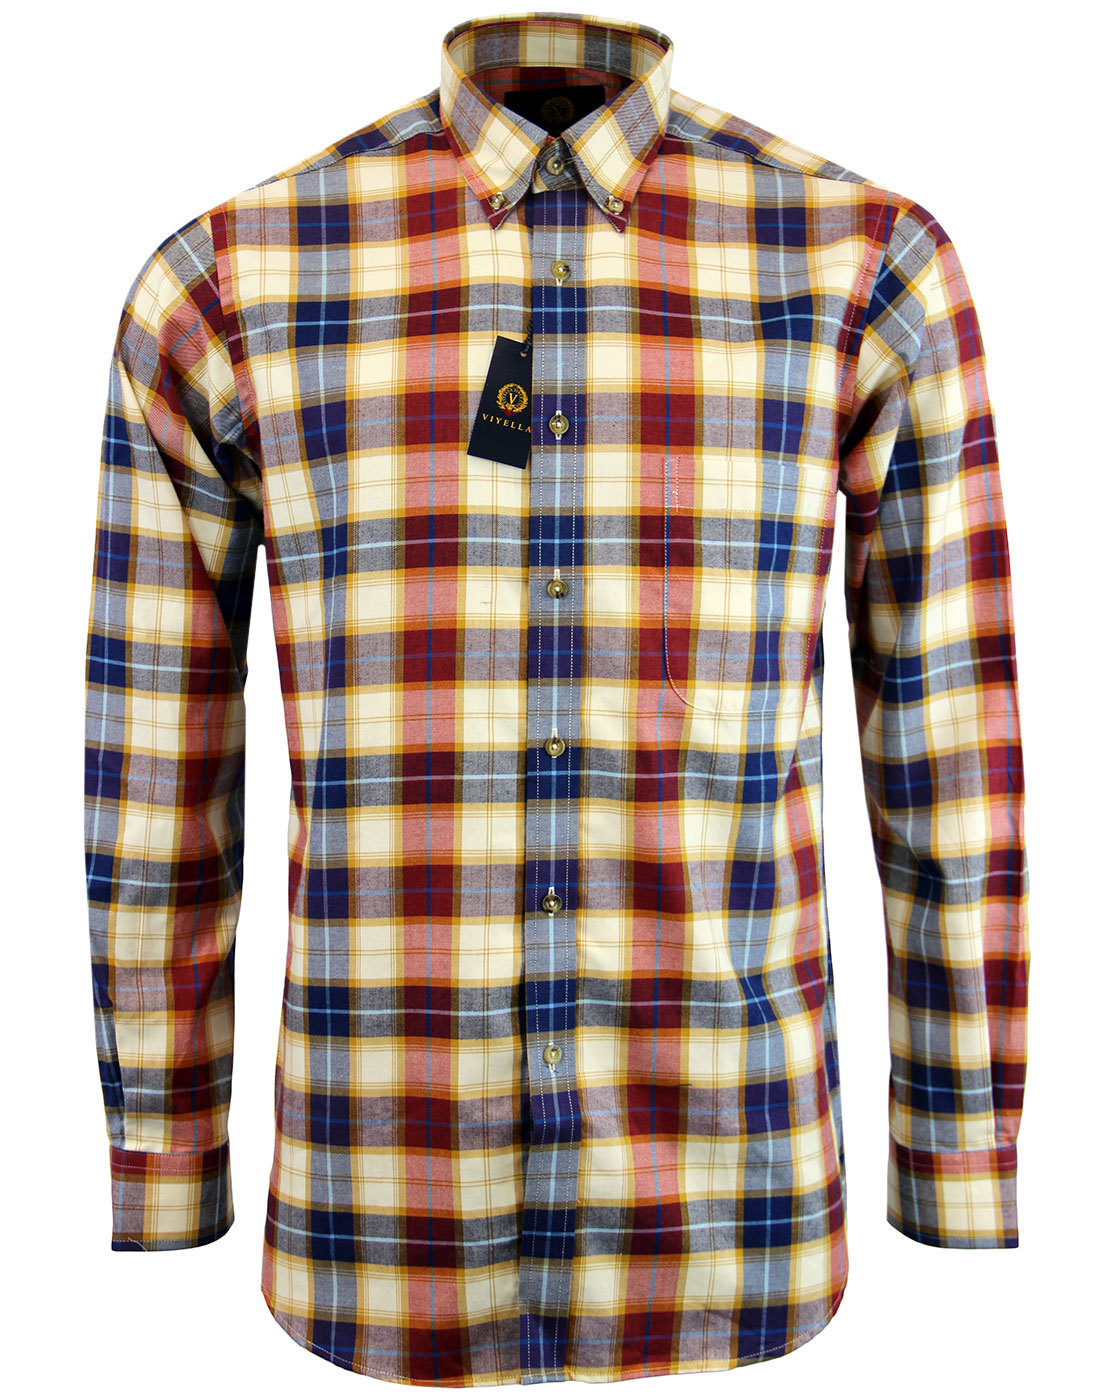 VIYELLA 60s Mod Button Down Gold Plaid Check Shirt